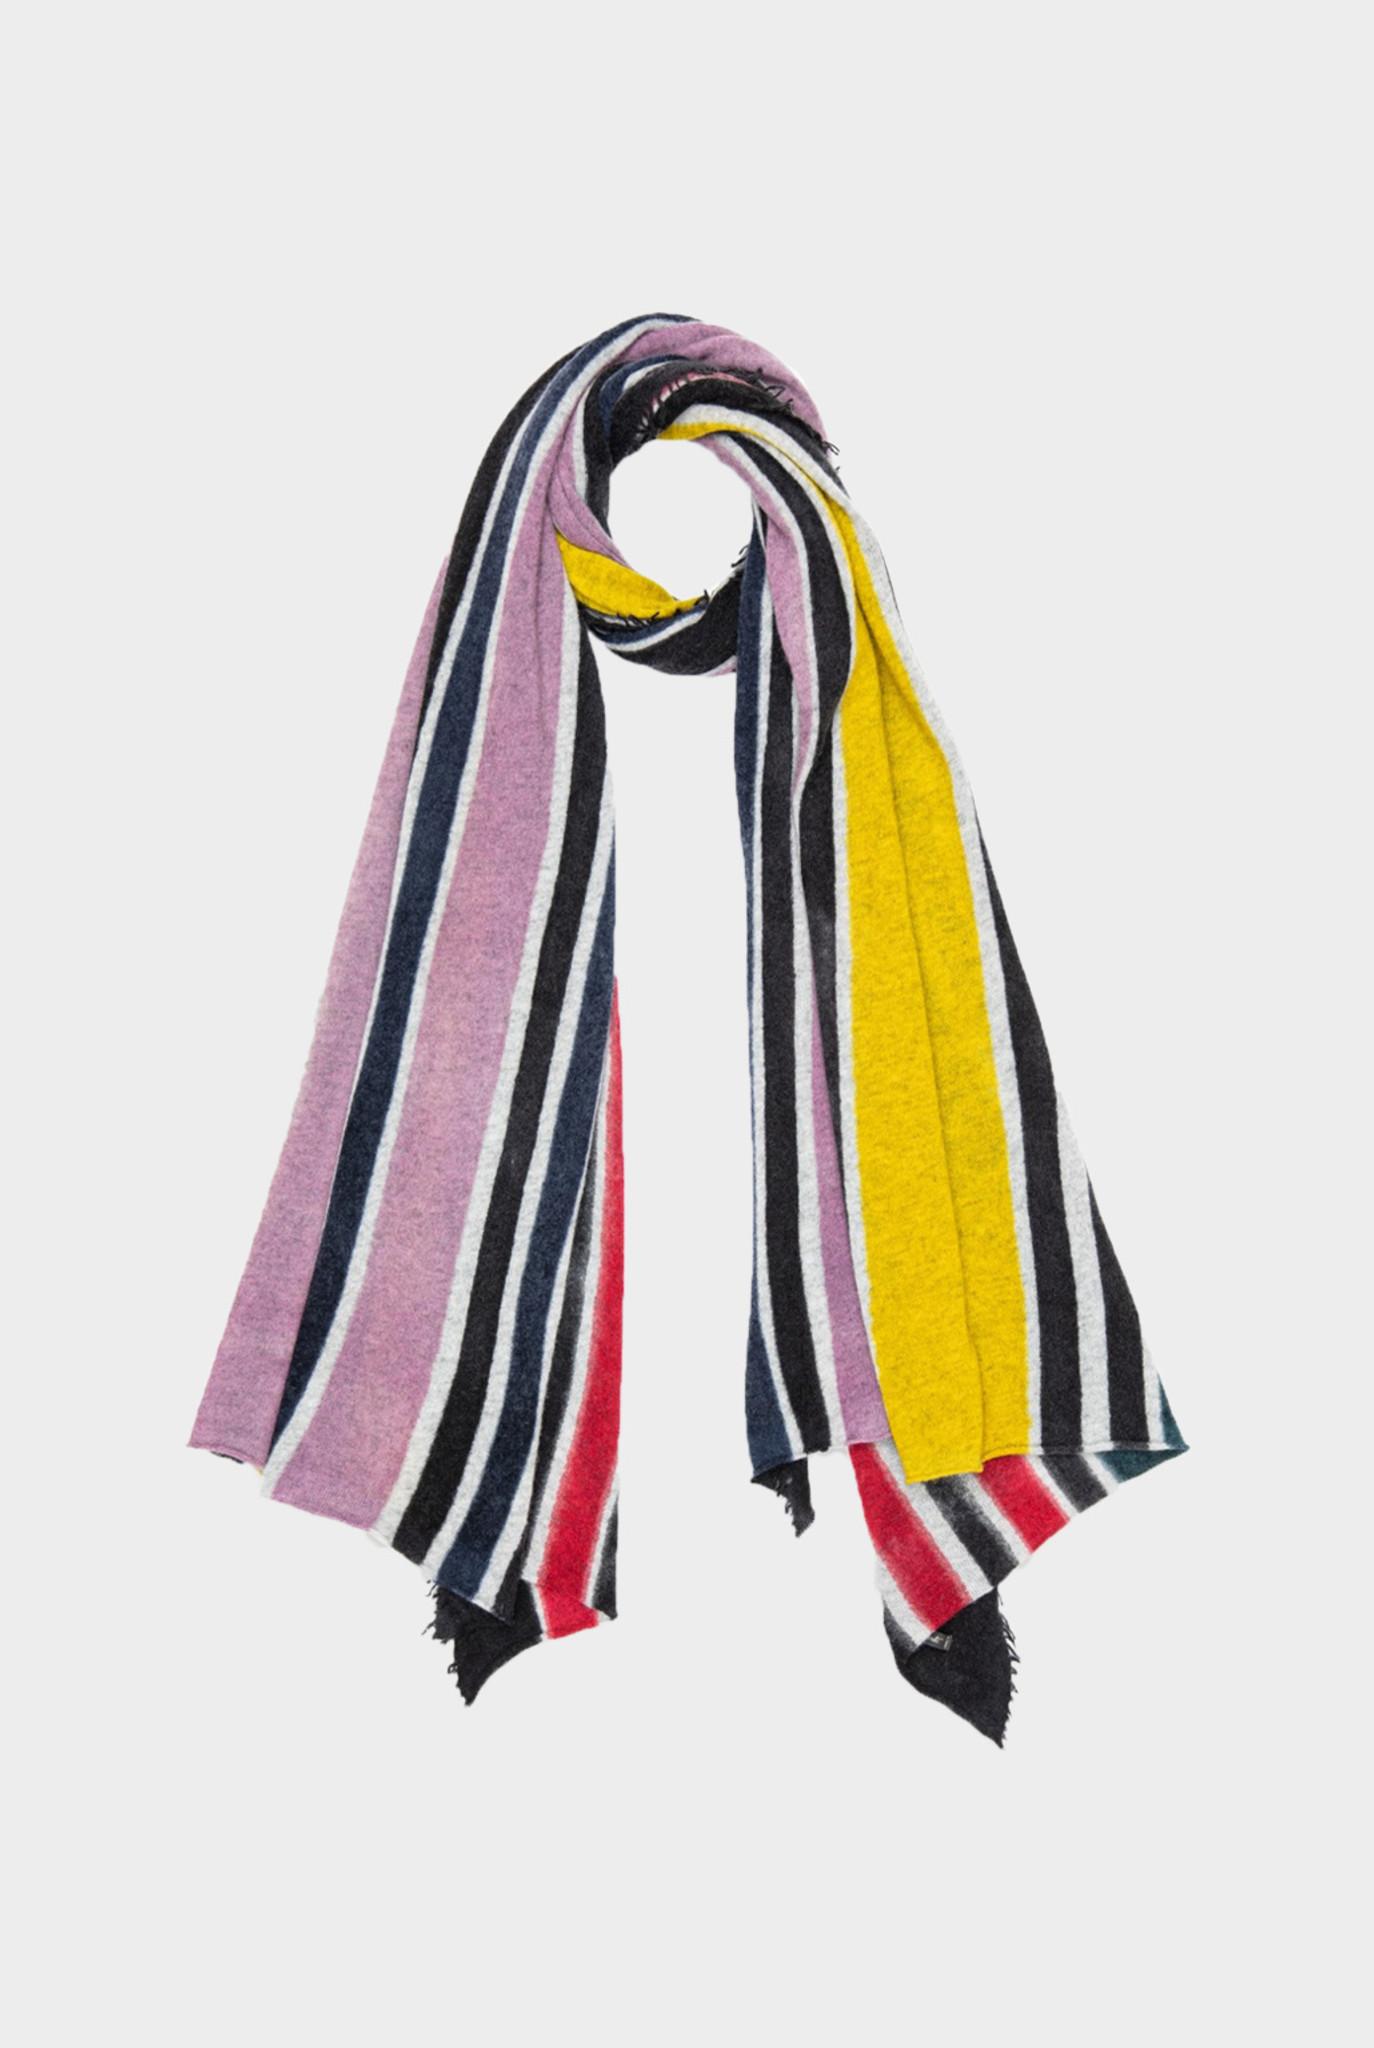 Pippo Scarf Scarf Multi Color Stripes Lilac Yellow